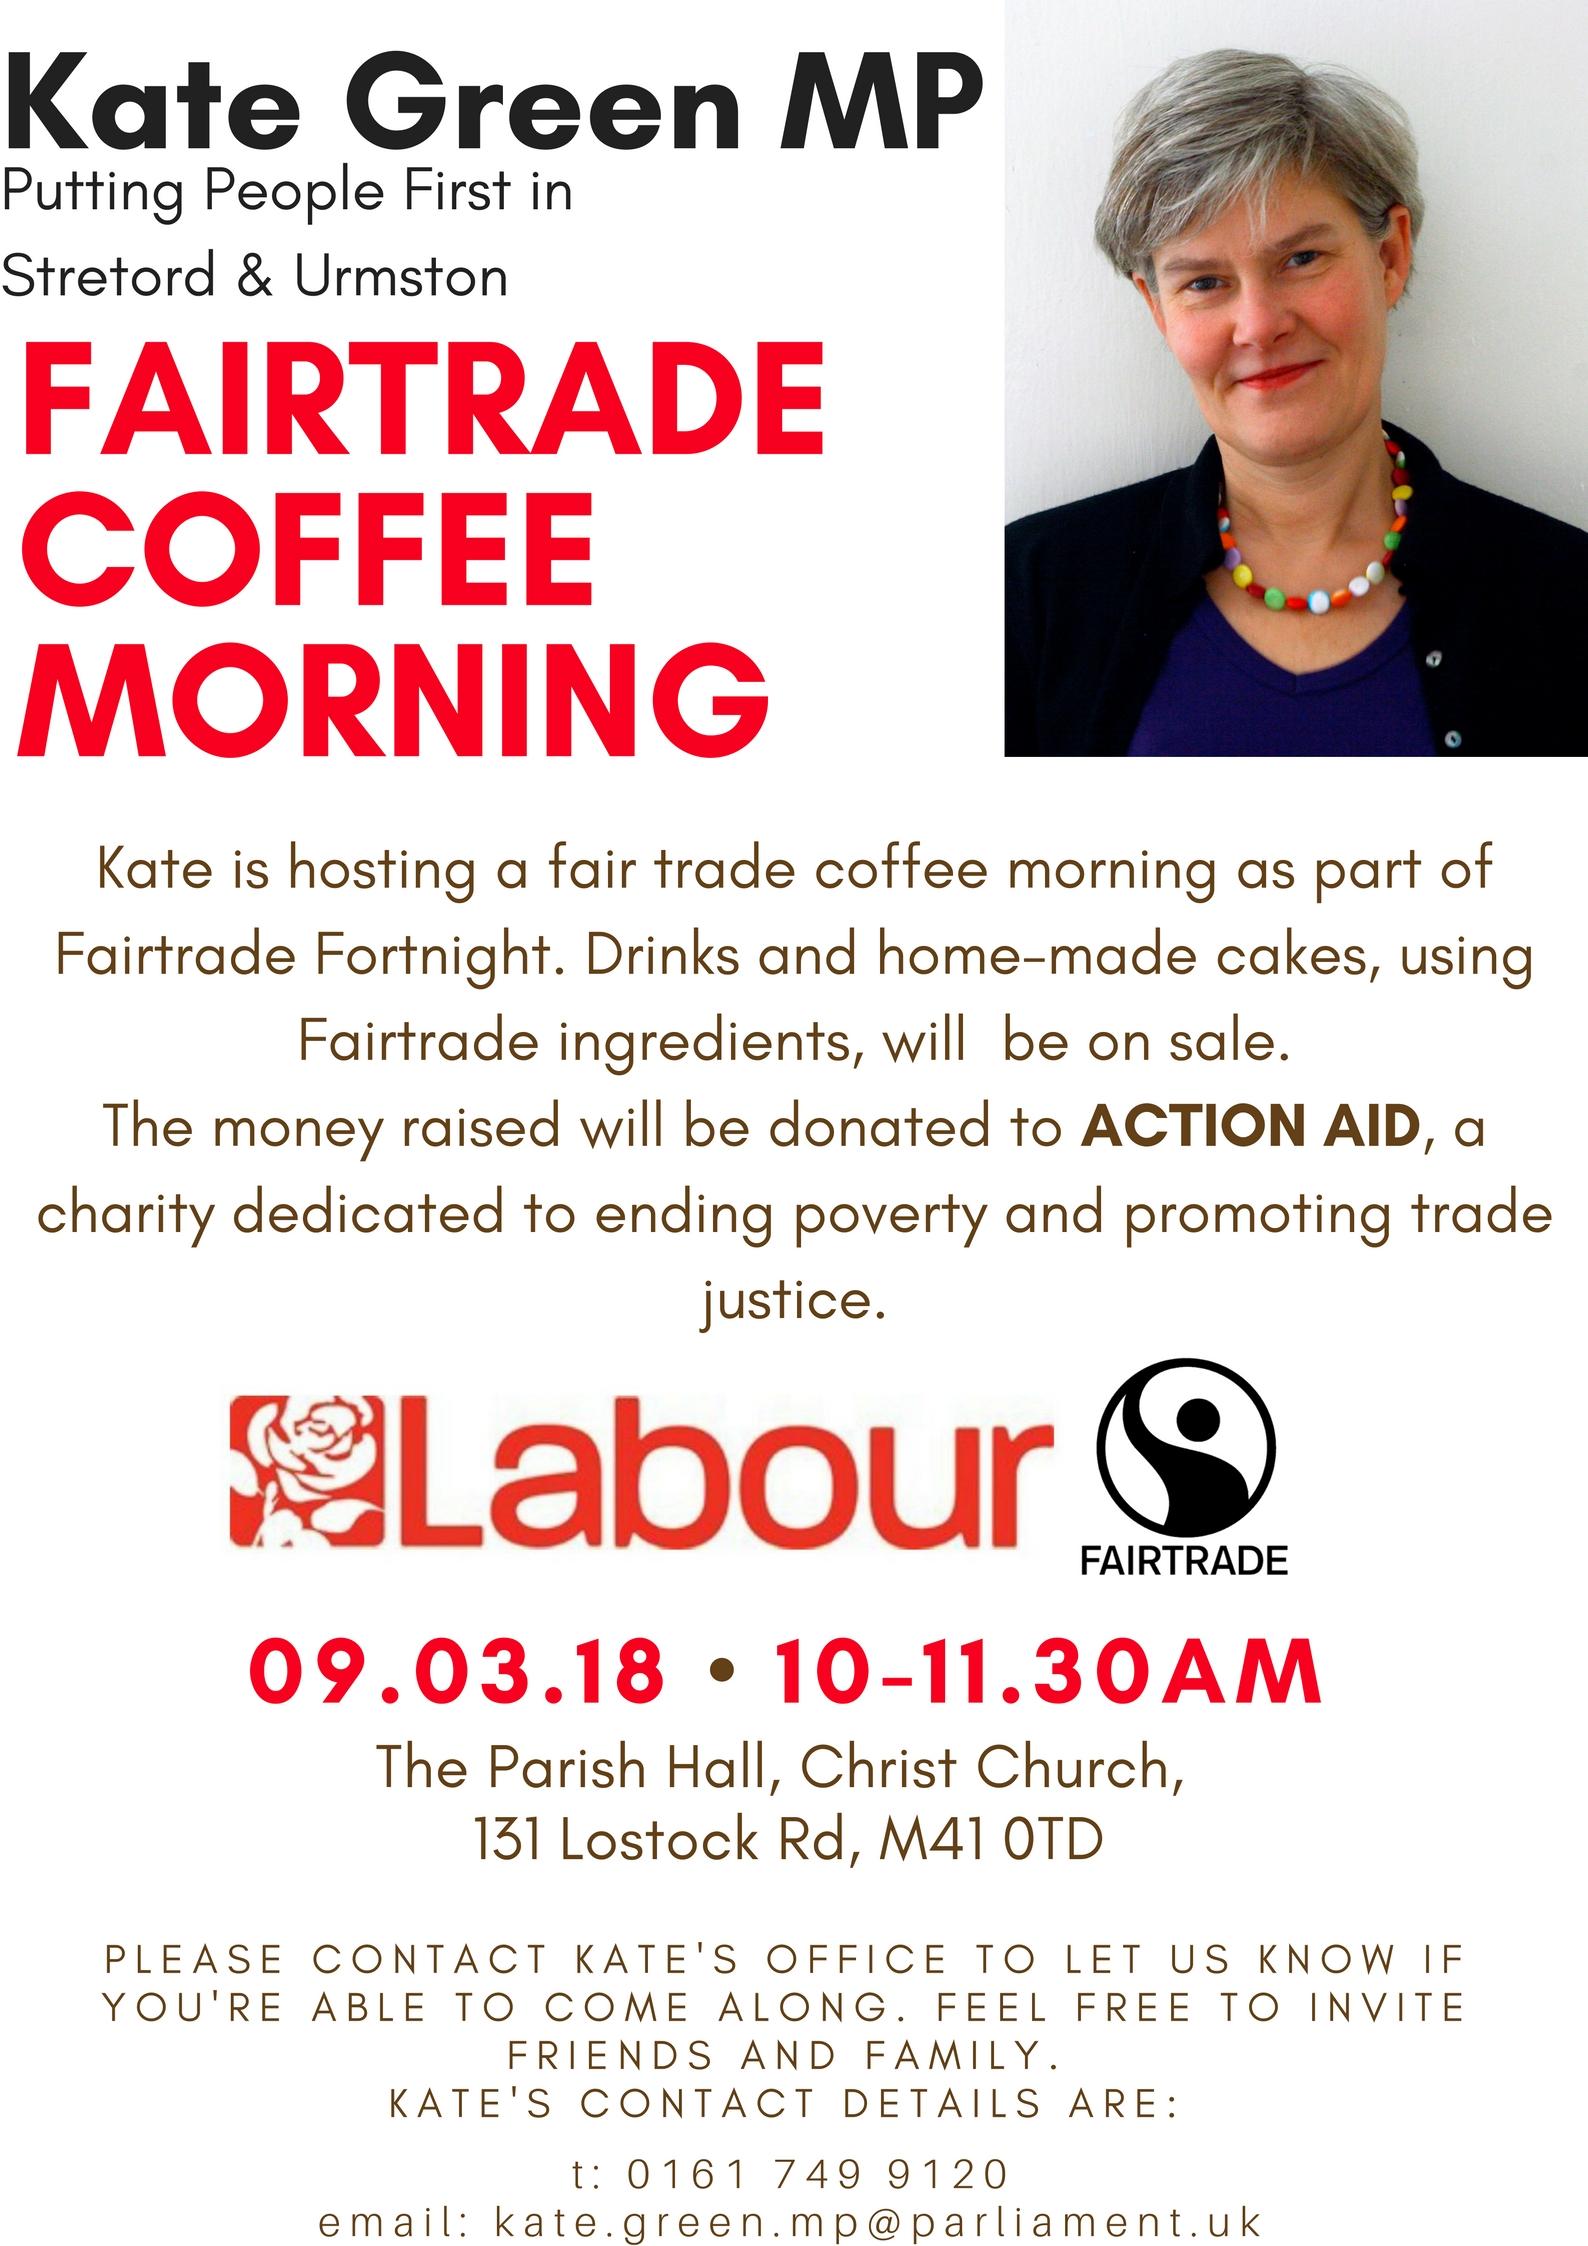 Fairtrade_coffee_morning_new_2018.jpg